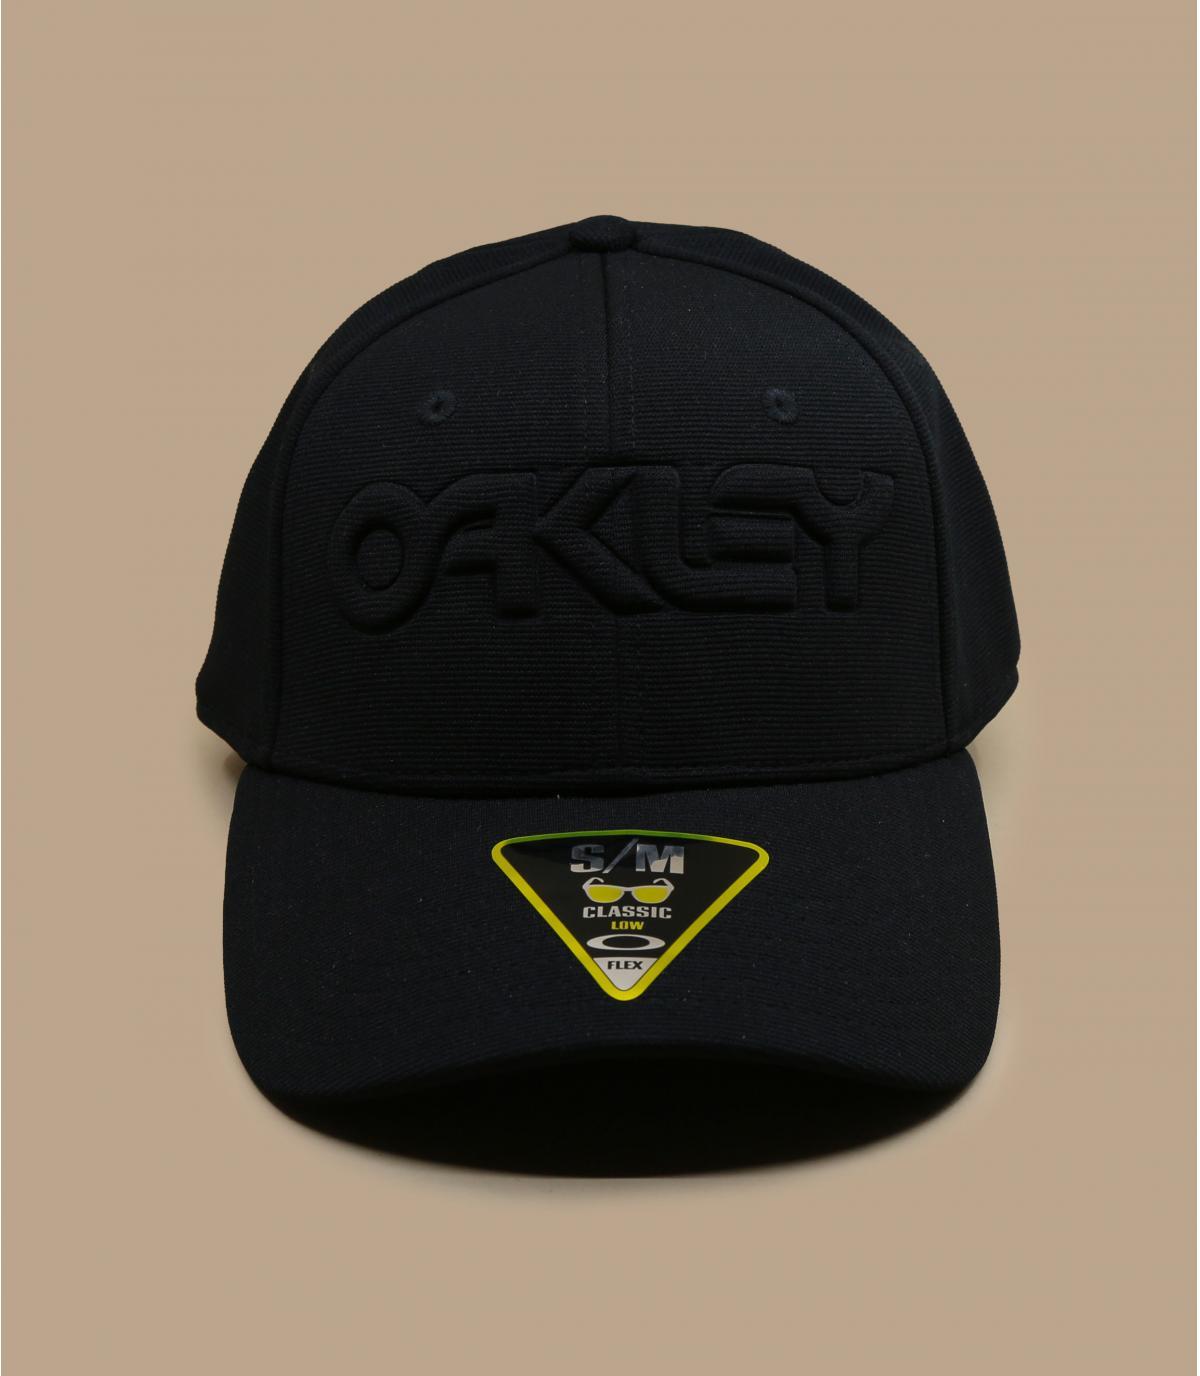 Oakley zwarte pet met logo